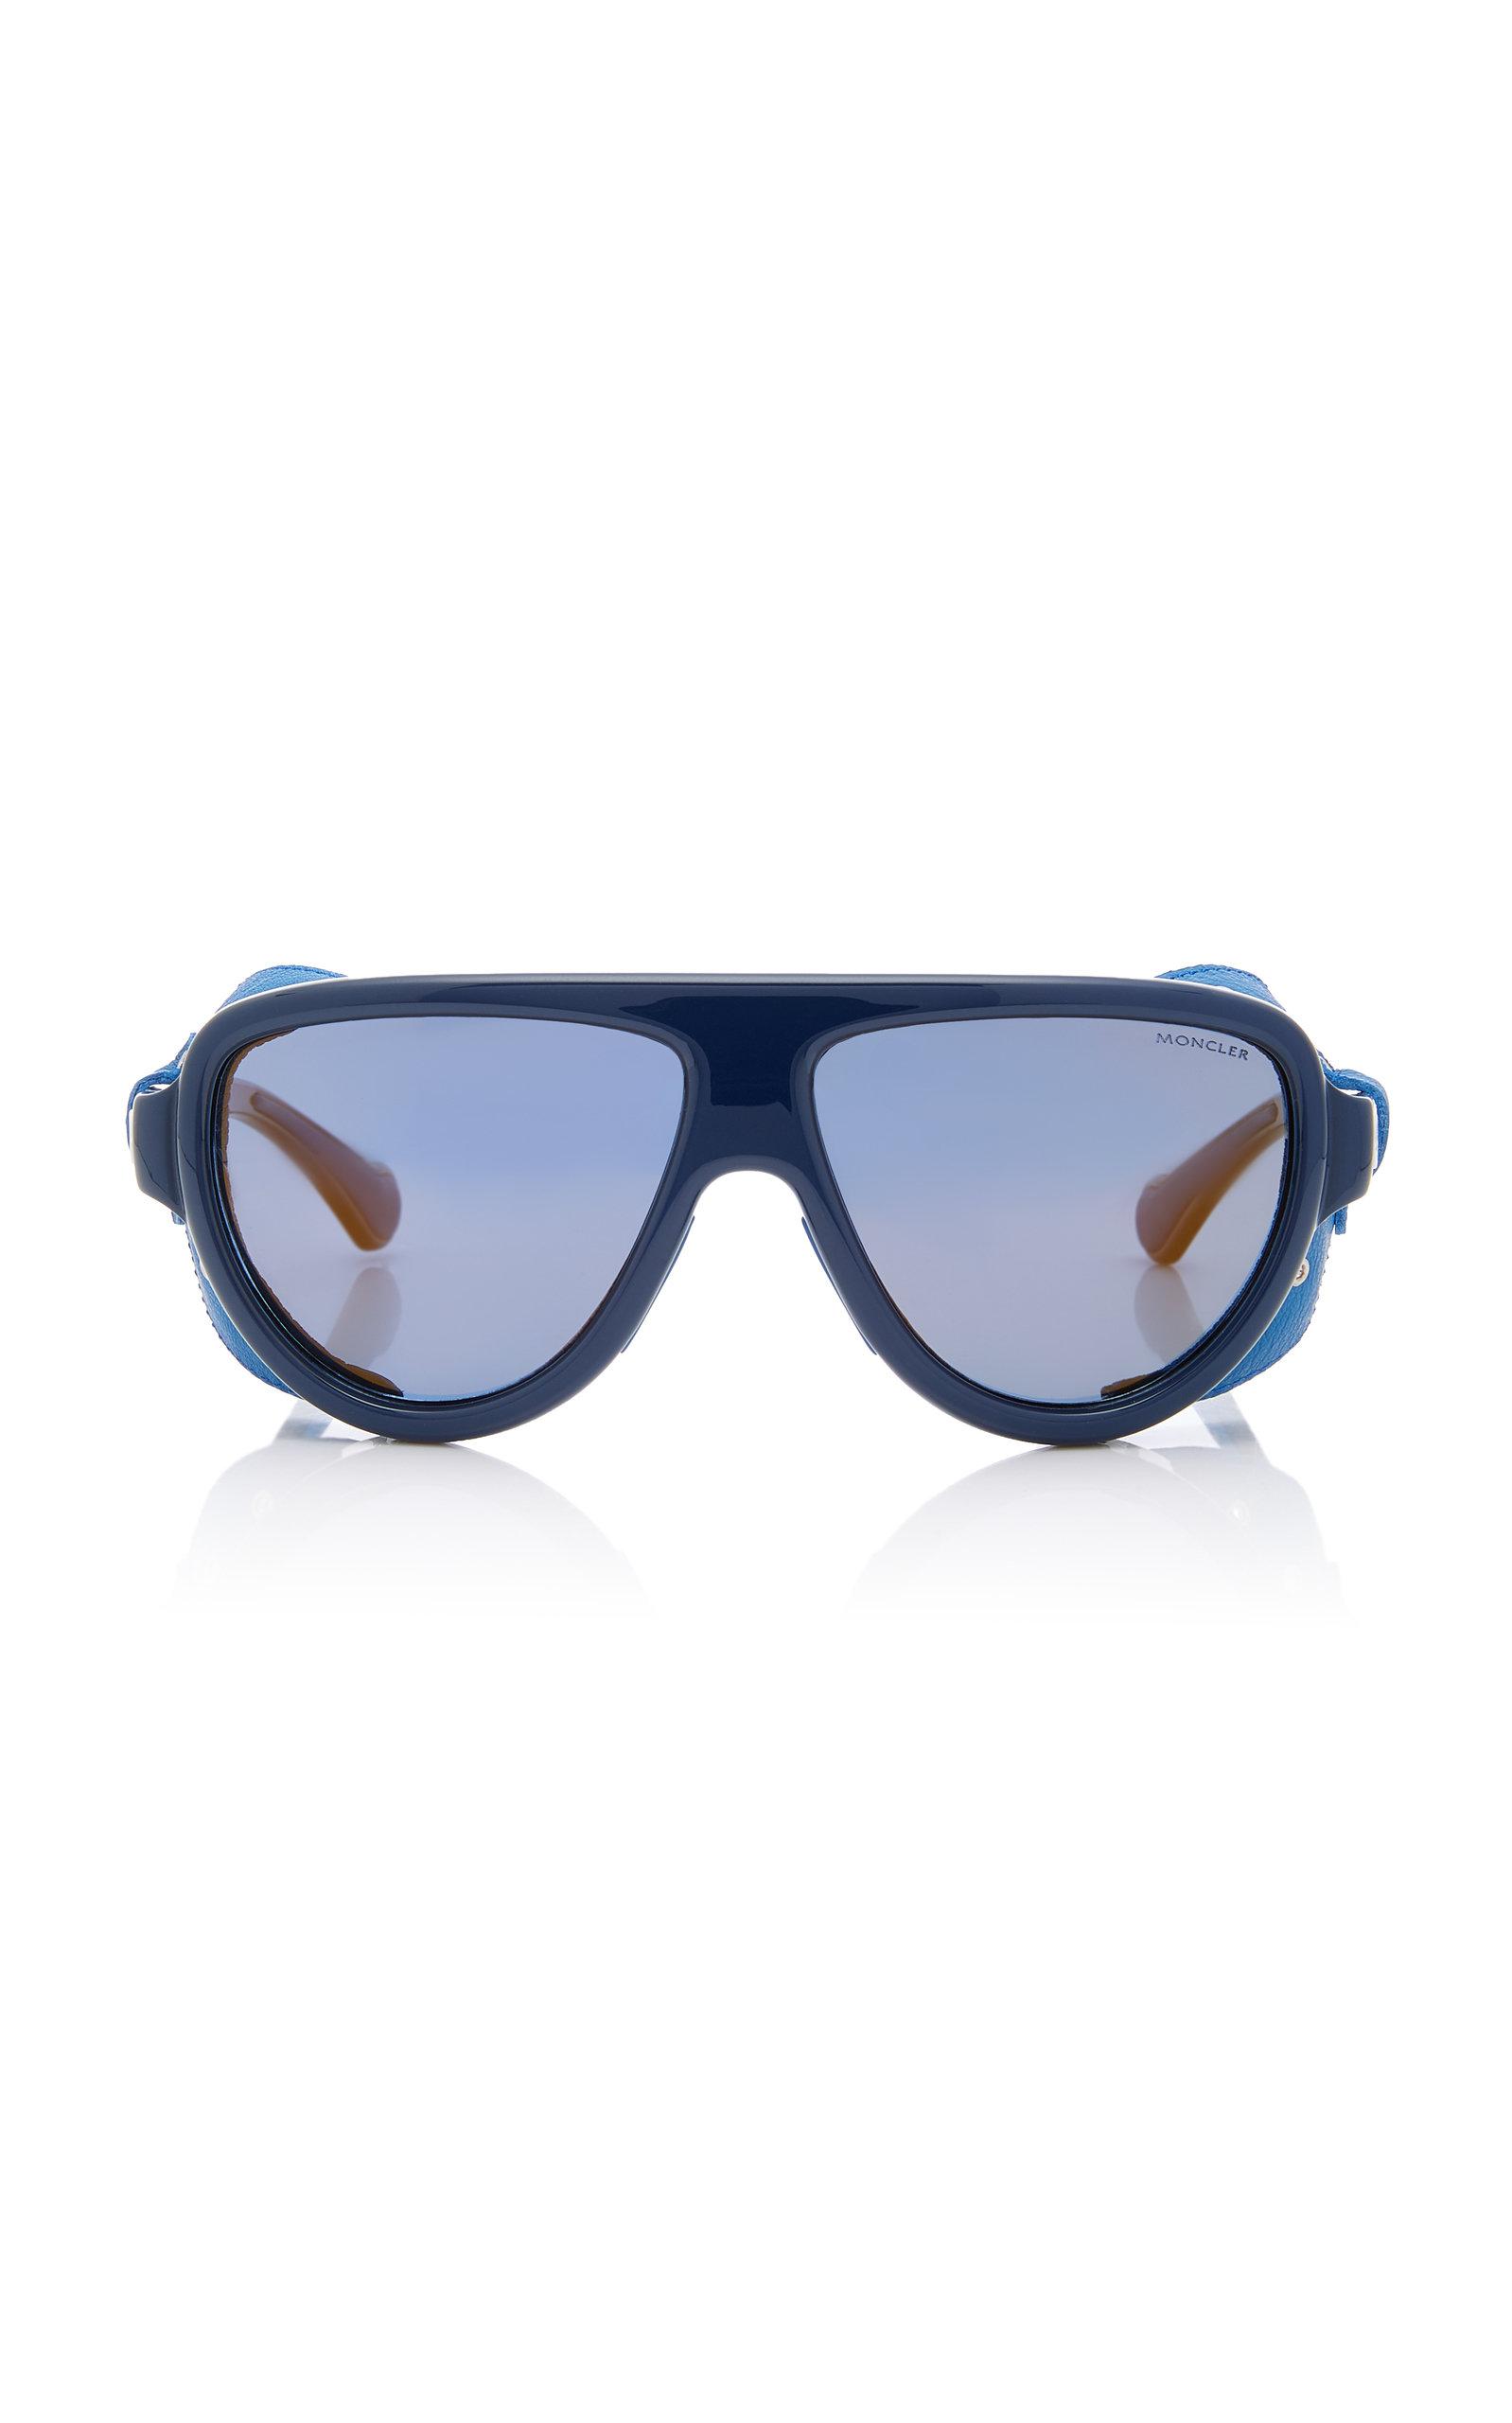 45536a418a Moncler sunglasses Acetate and Leather D-Frame Sunglasses. CLOSE. Loading